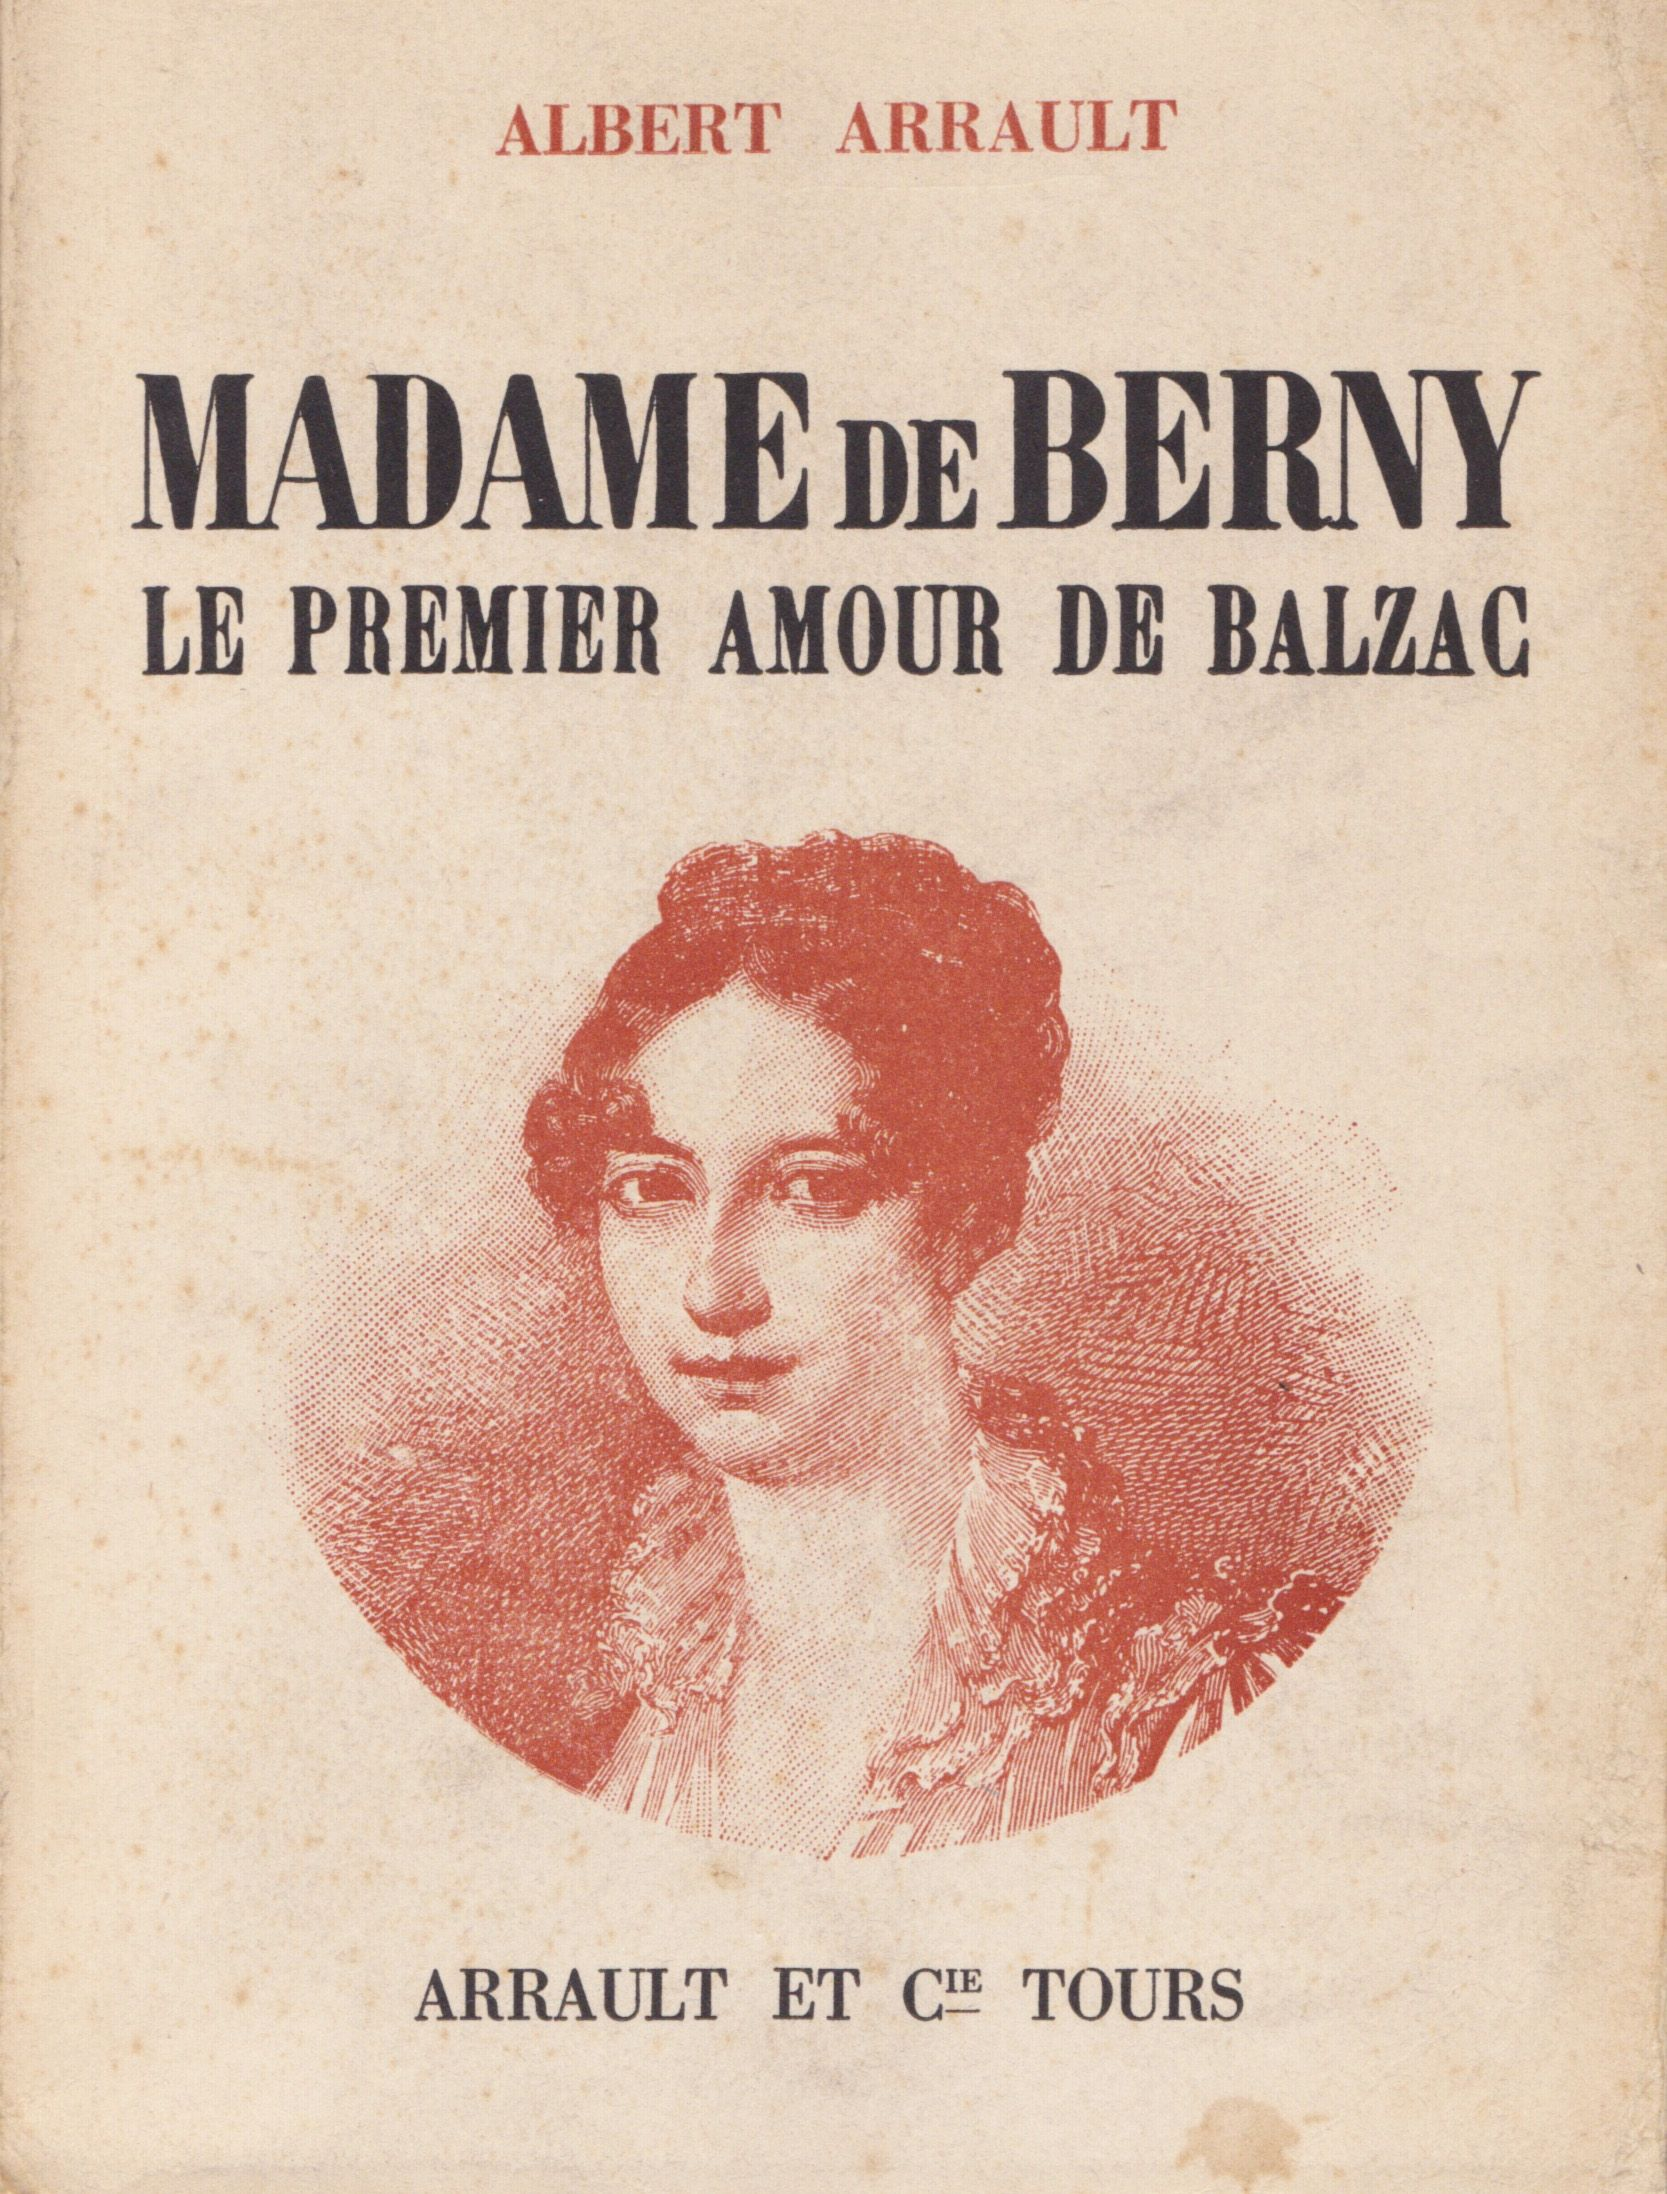 Madame de Berny. Le premier amour de Balzac